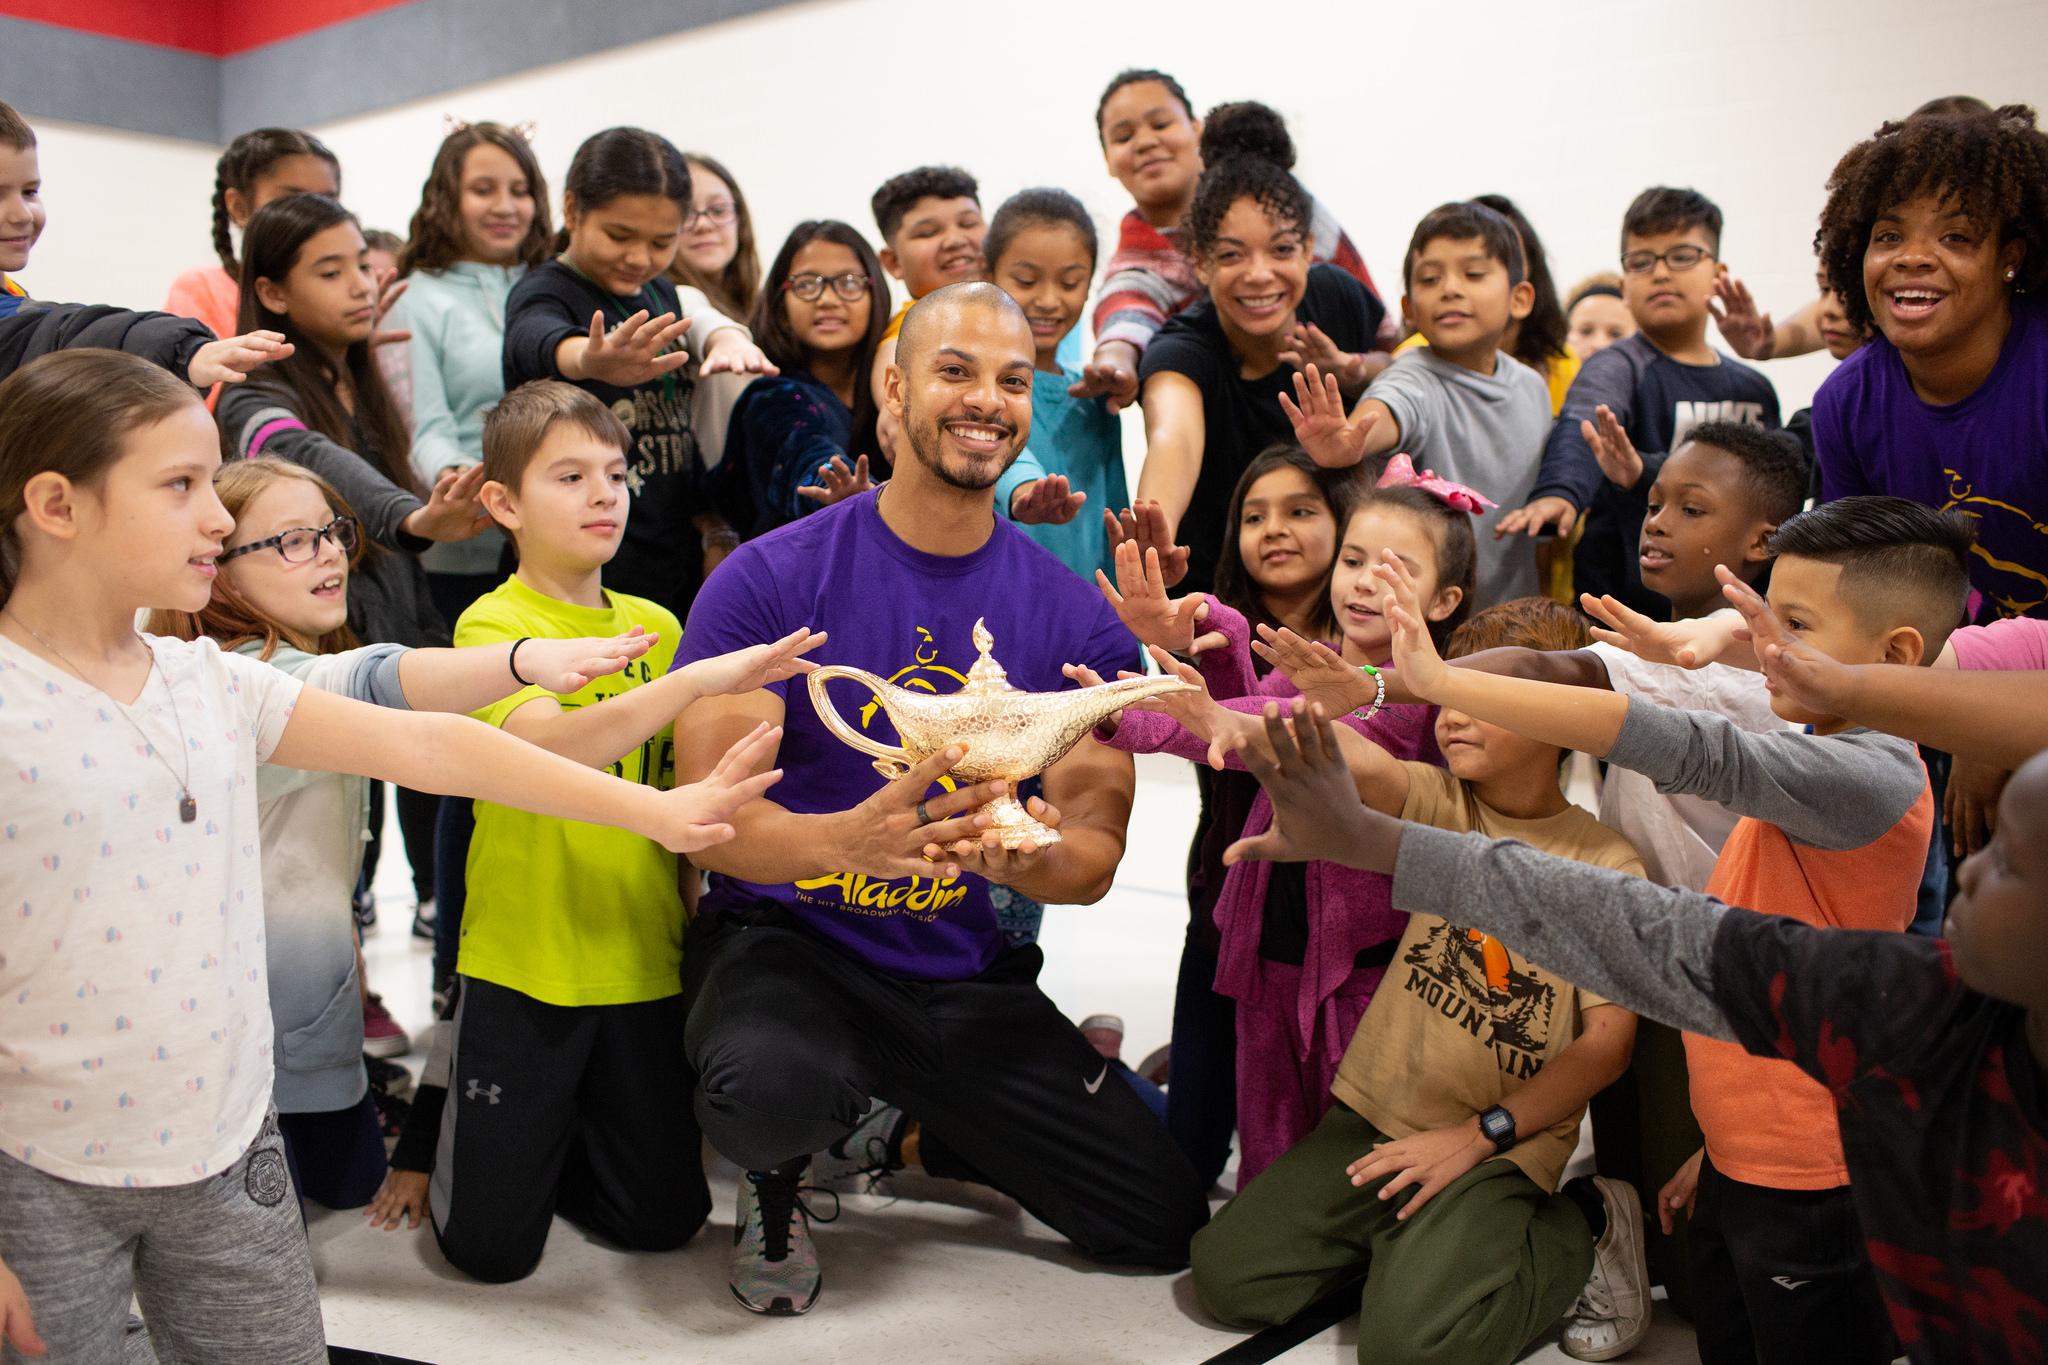 Aladdin Cast Makes Magic At Madison Elementary School Inside Des Moines Public Schools Calendar